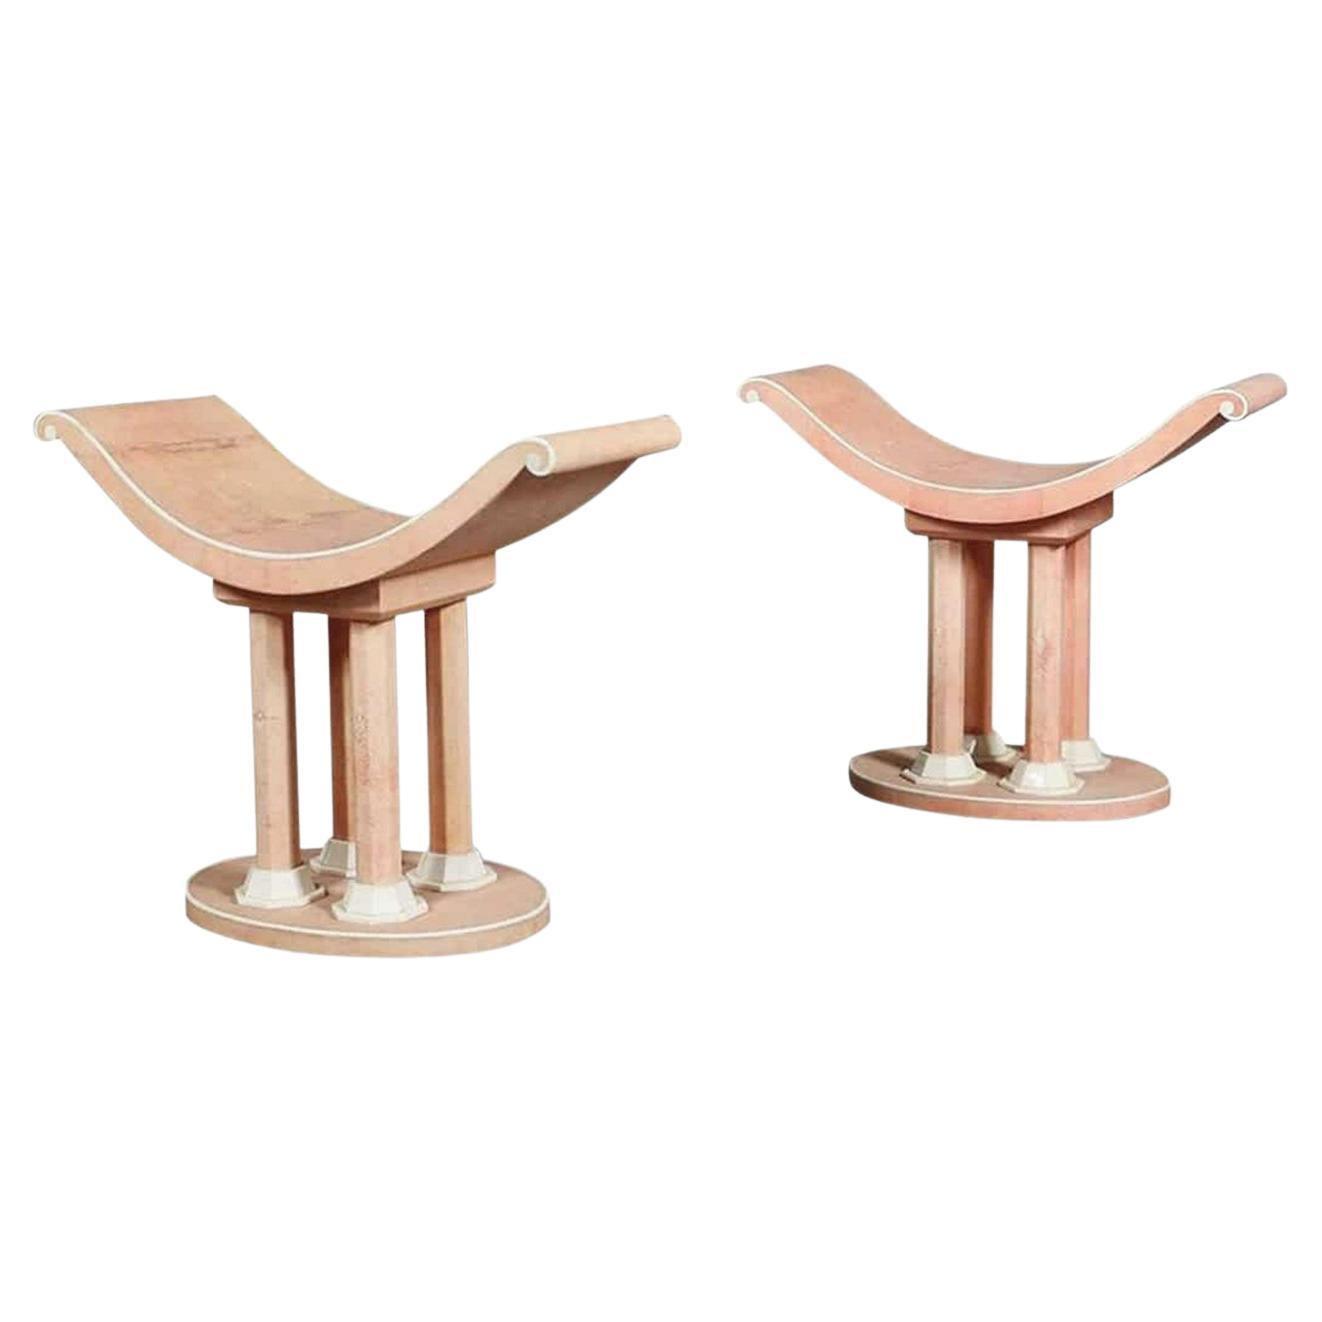 Leleu Art Deco Decorative Chairs